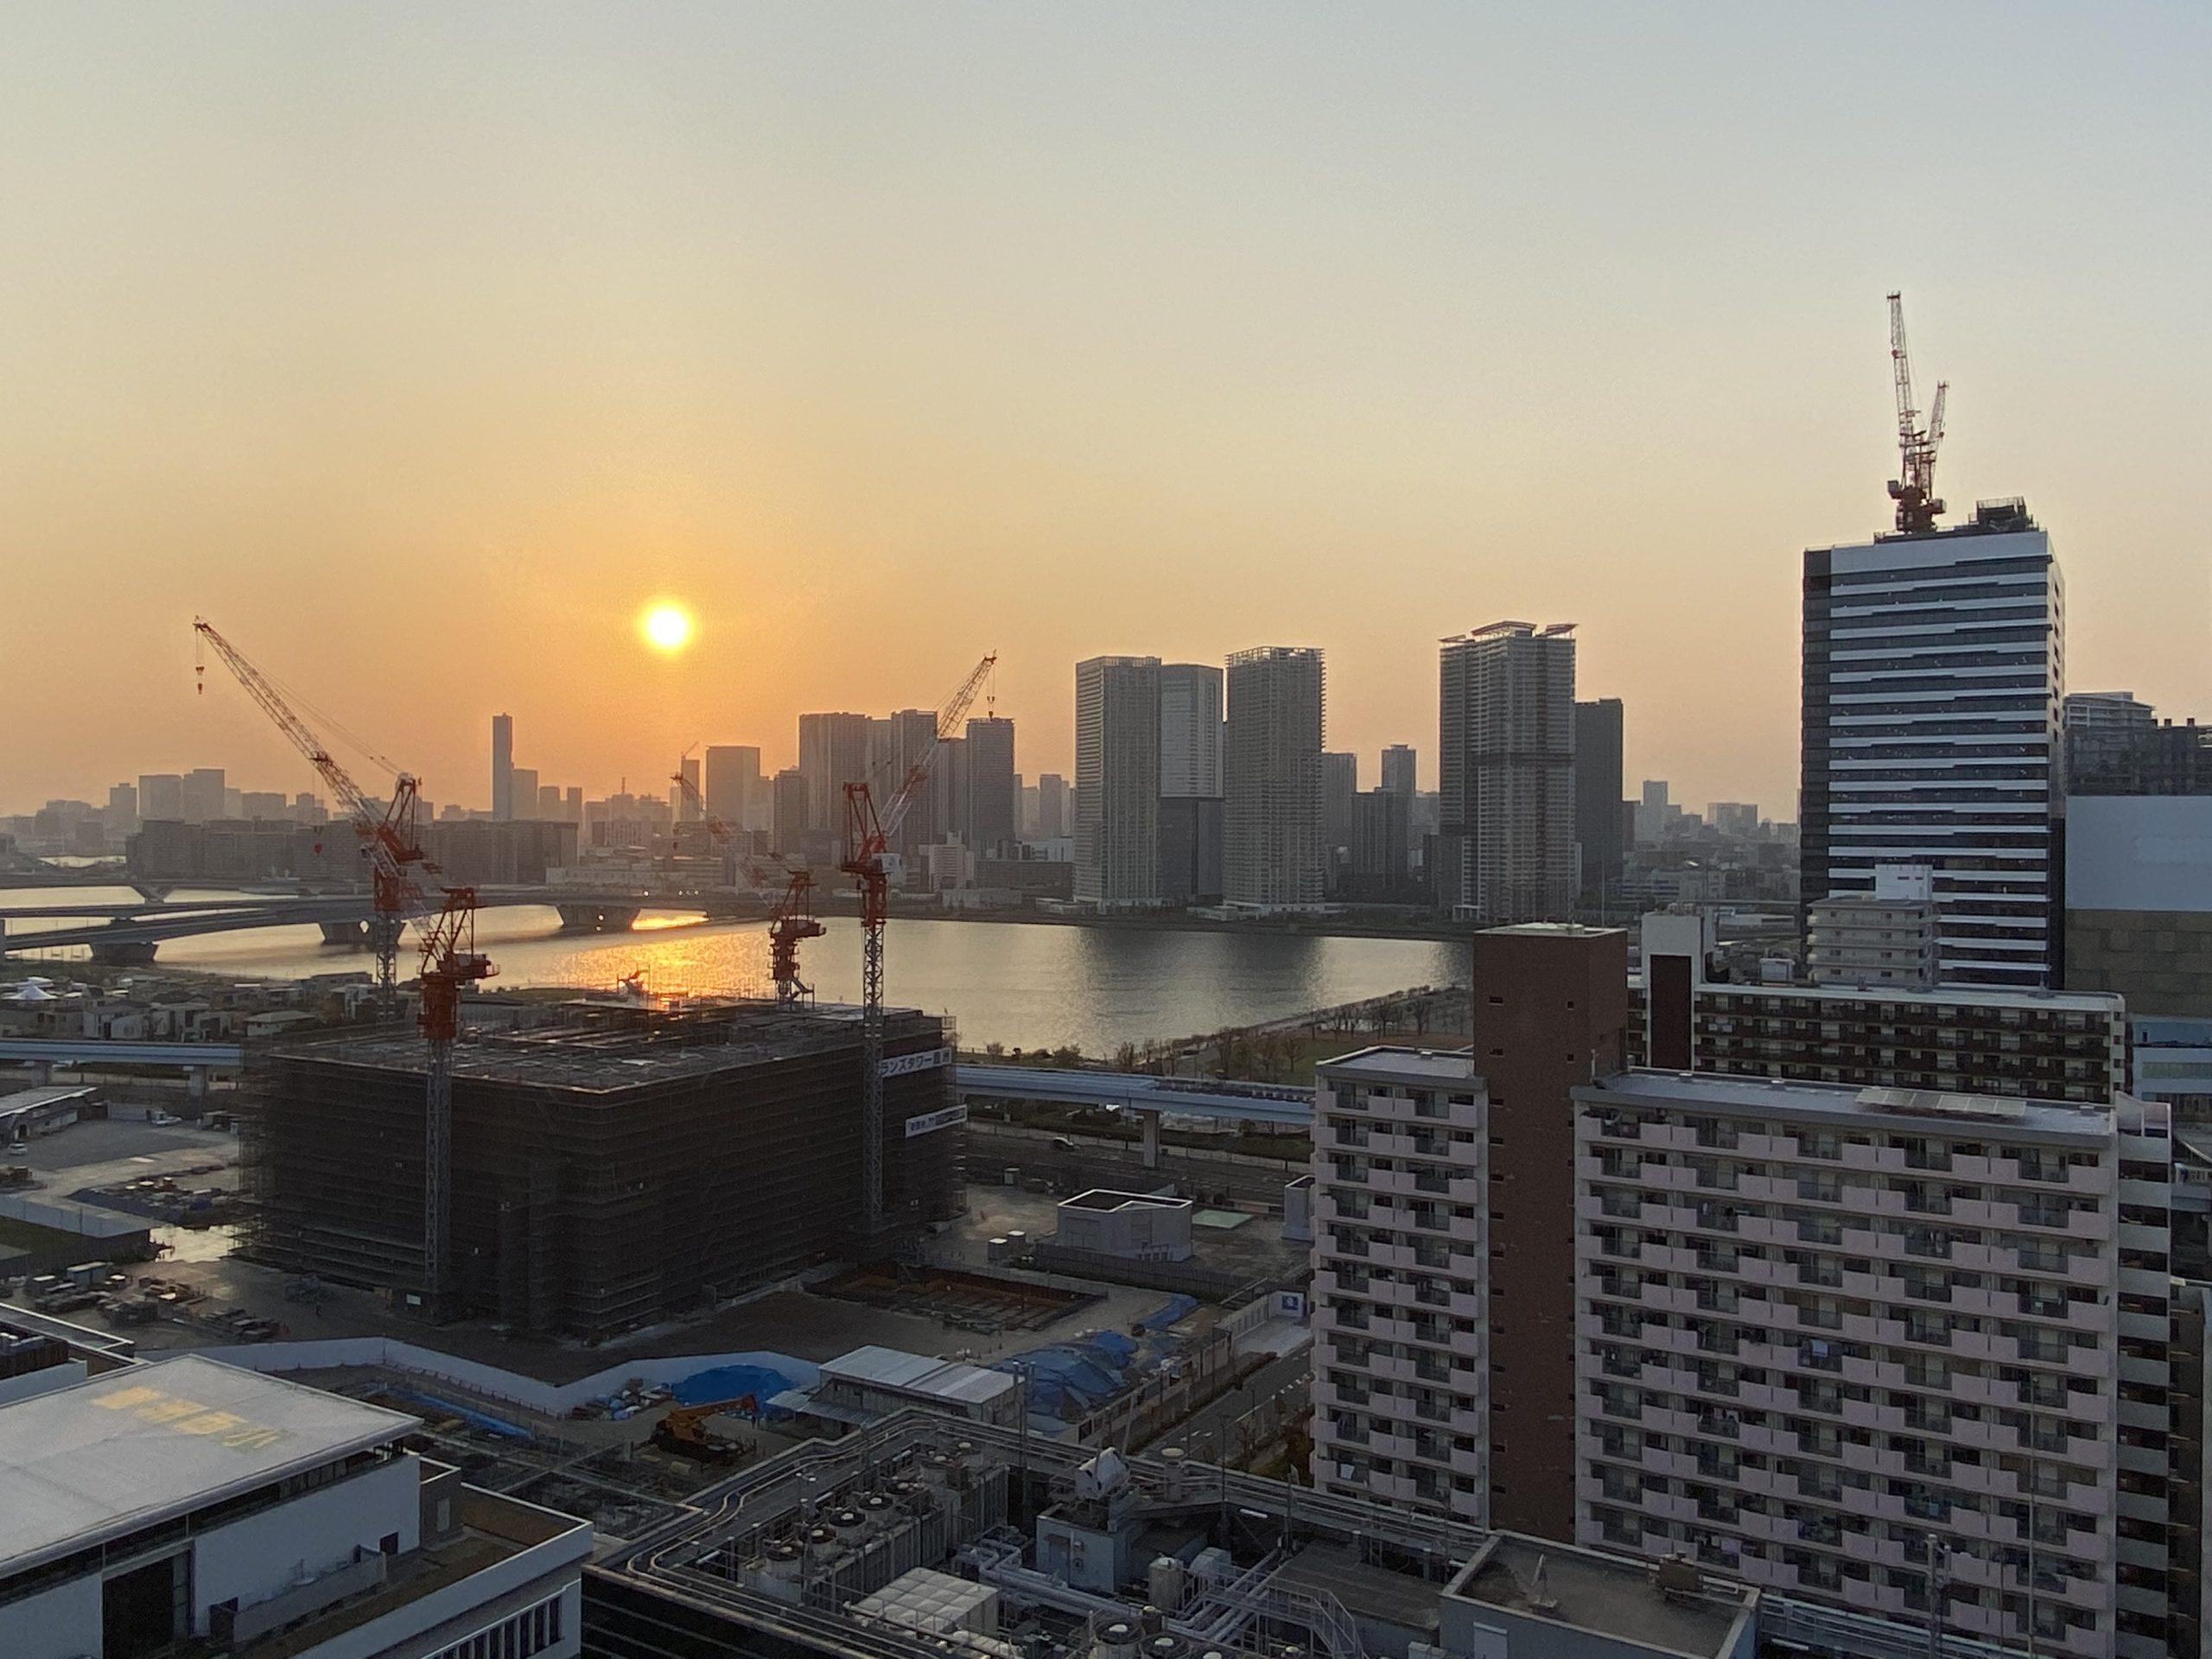 緊急事態宣言〜初日の豊洲